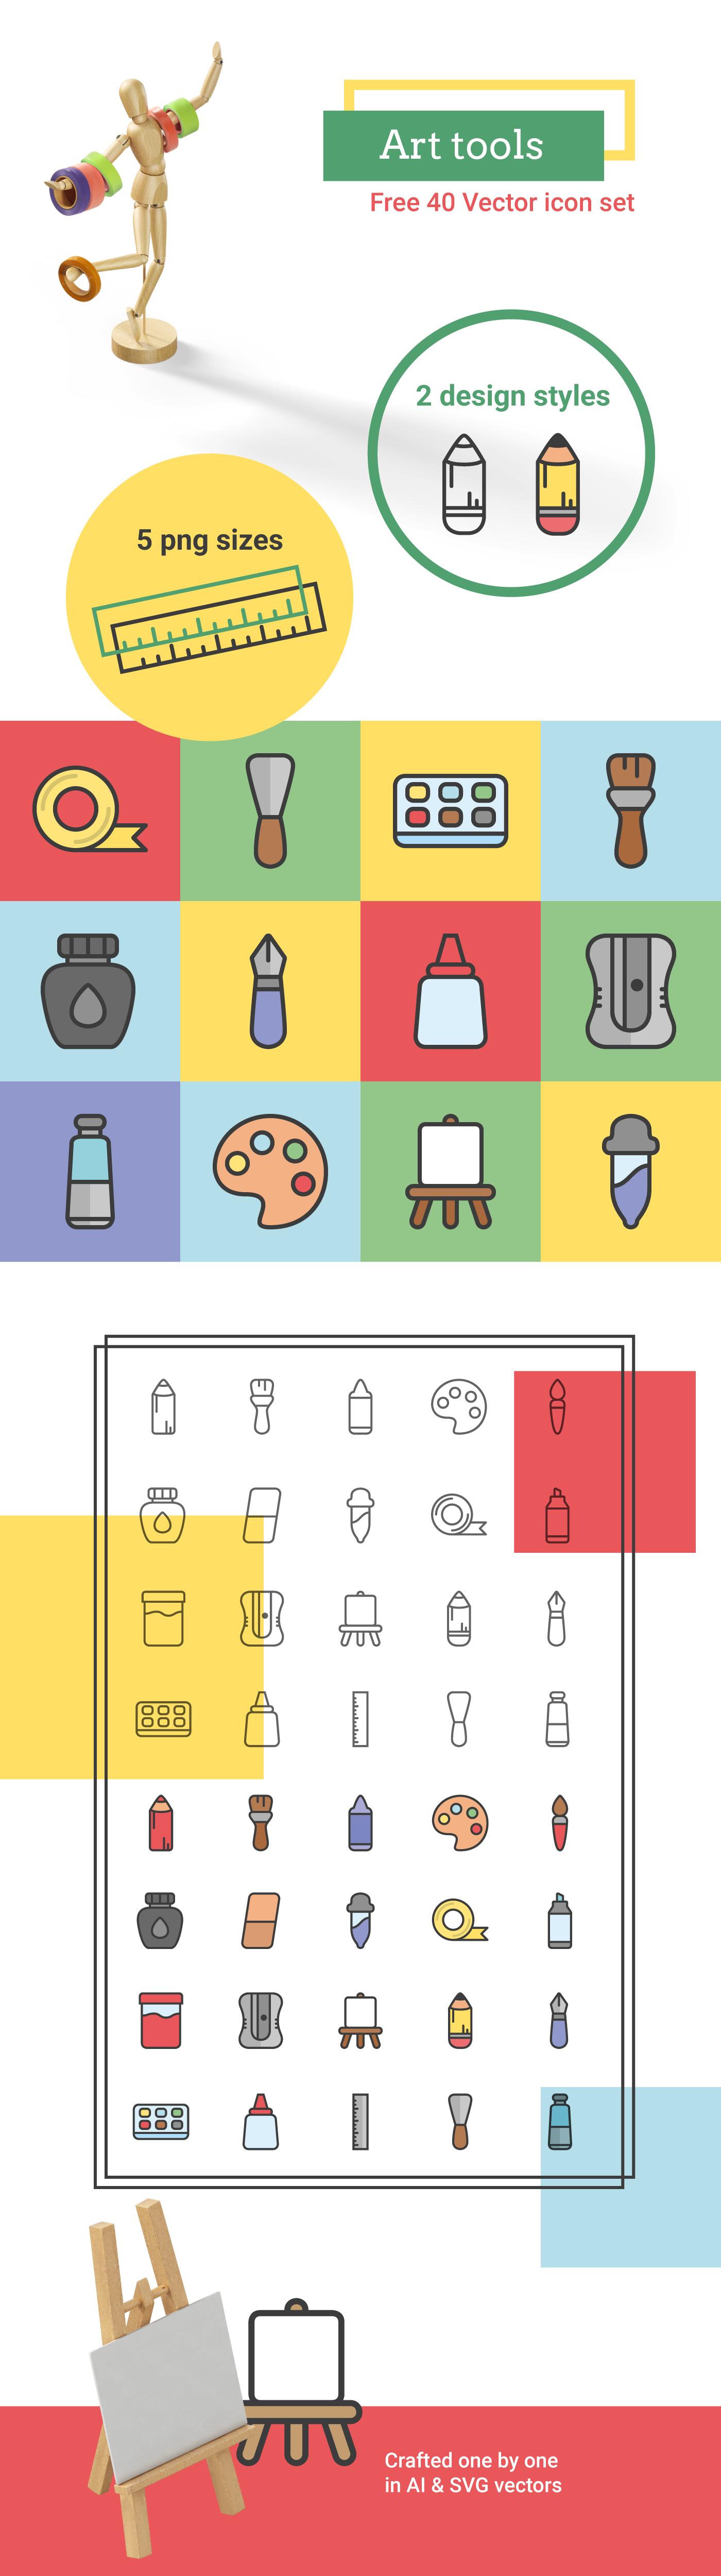 art_tools_free_icon_set_1